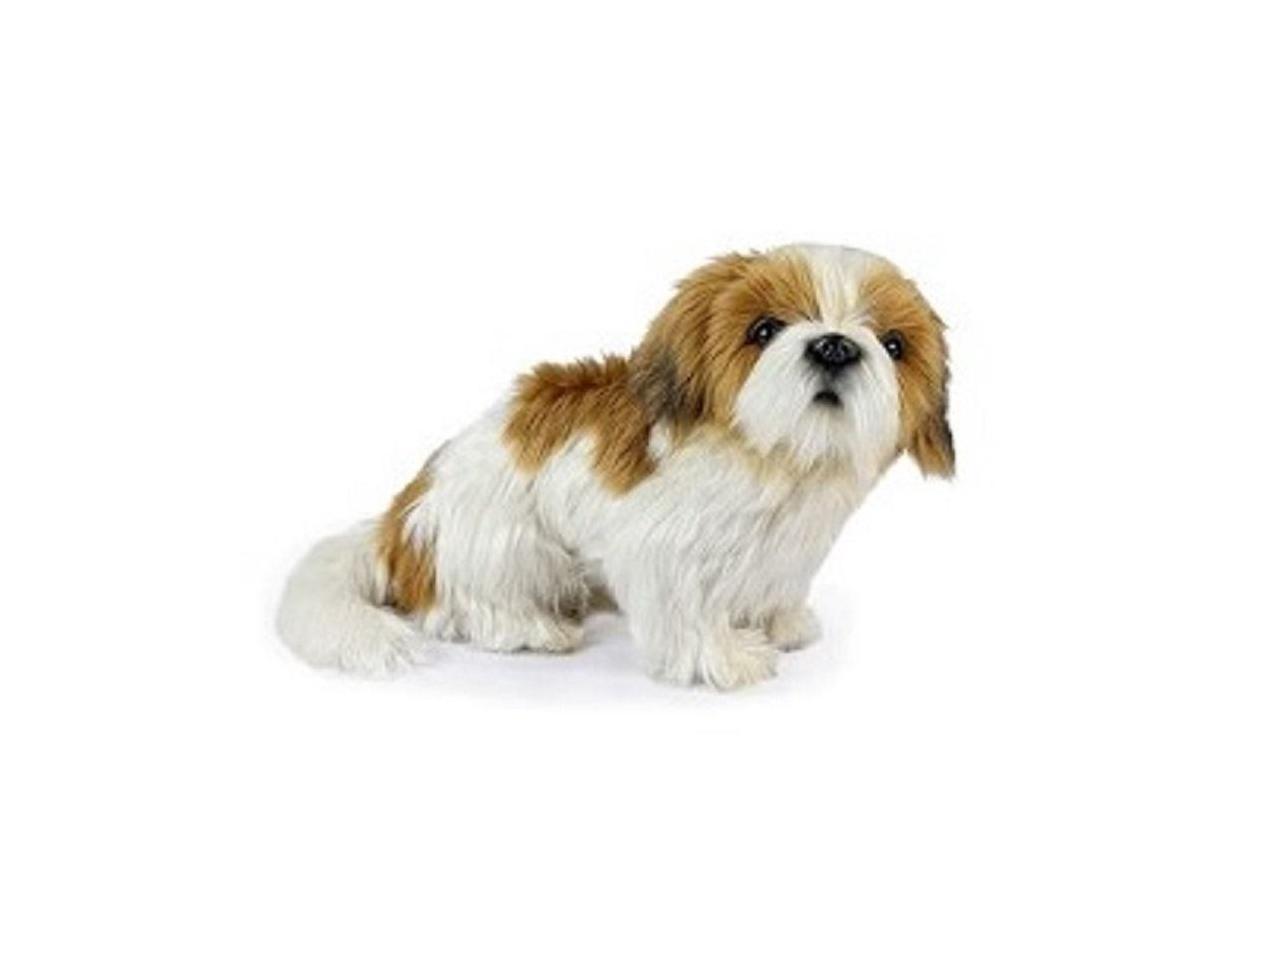 Set Of Dog Stuffed Animals, Set Of 3 Handcrafted Shih Tzu Dog Stuffed Animals 11 75 Newegg Com